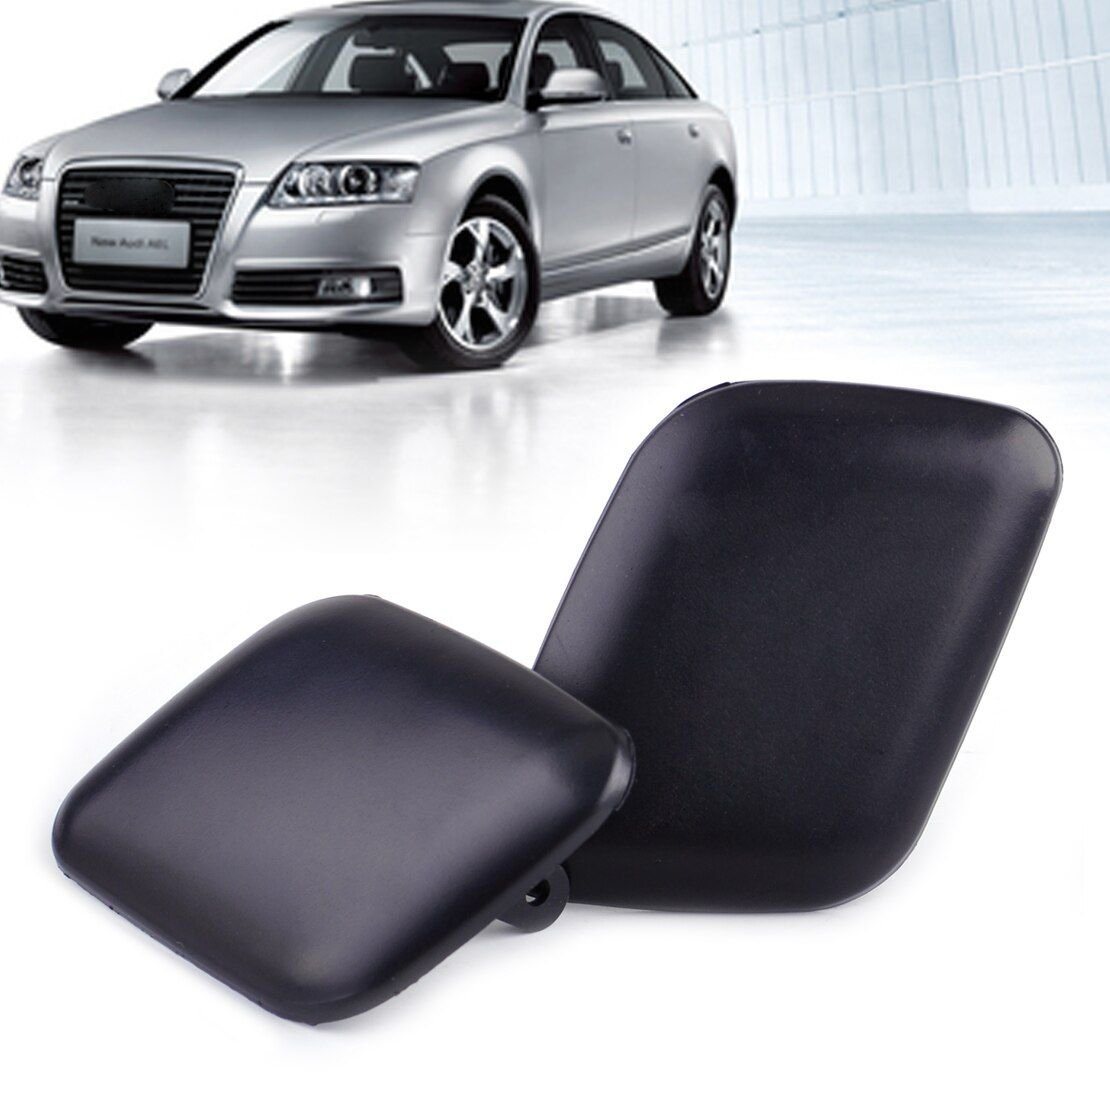 DWCX 1Pair Front Left & Right Bumper Headlight Washer Cover Cap 4B0 955 275 4B0 955 276 for Audi A6 C5 1998 1999 2000 2001 2002